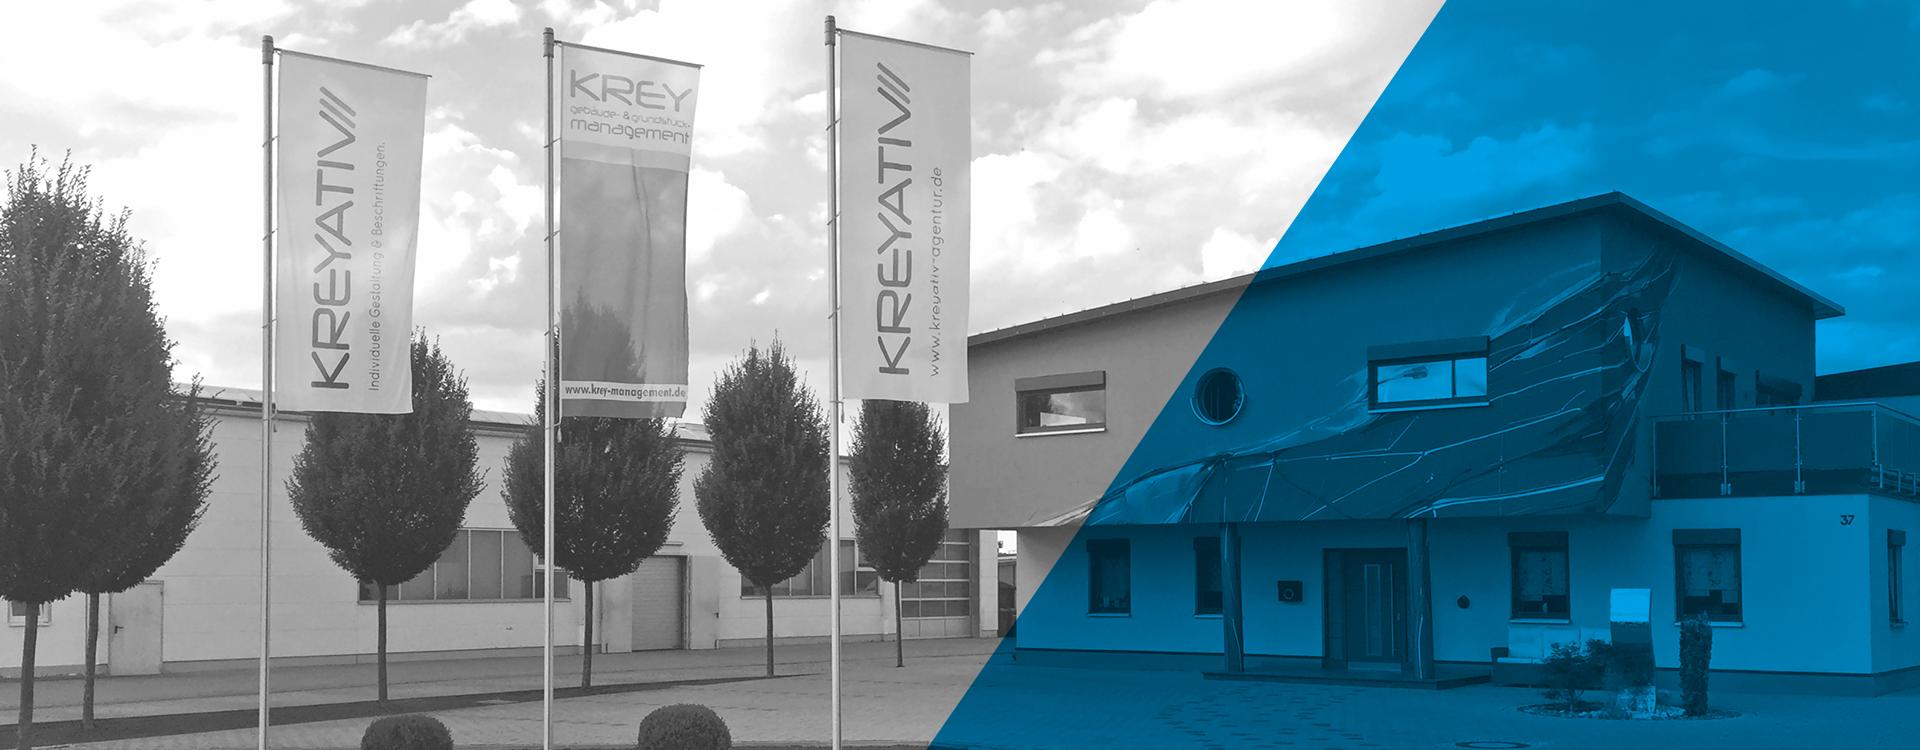 Kreyativ-Agentur-Firmengebaeude_2016